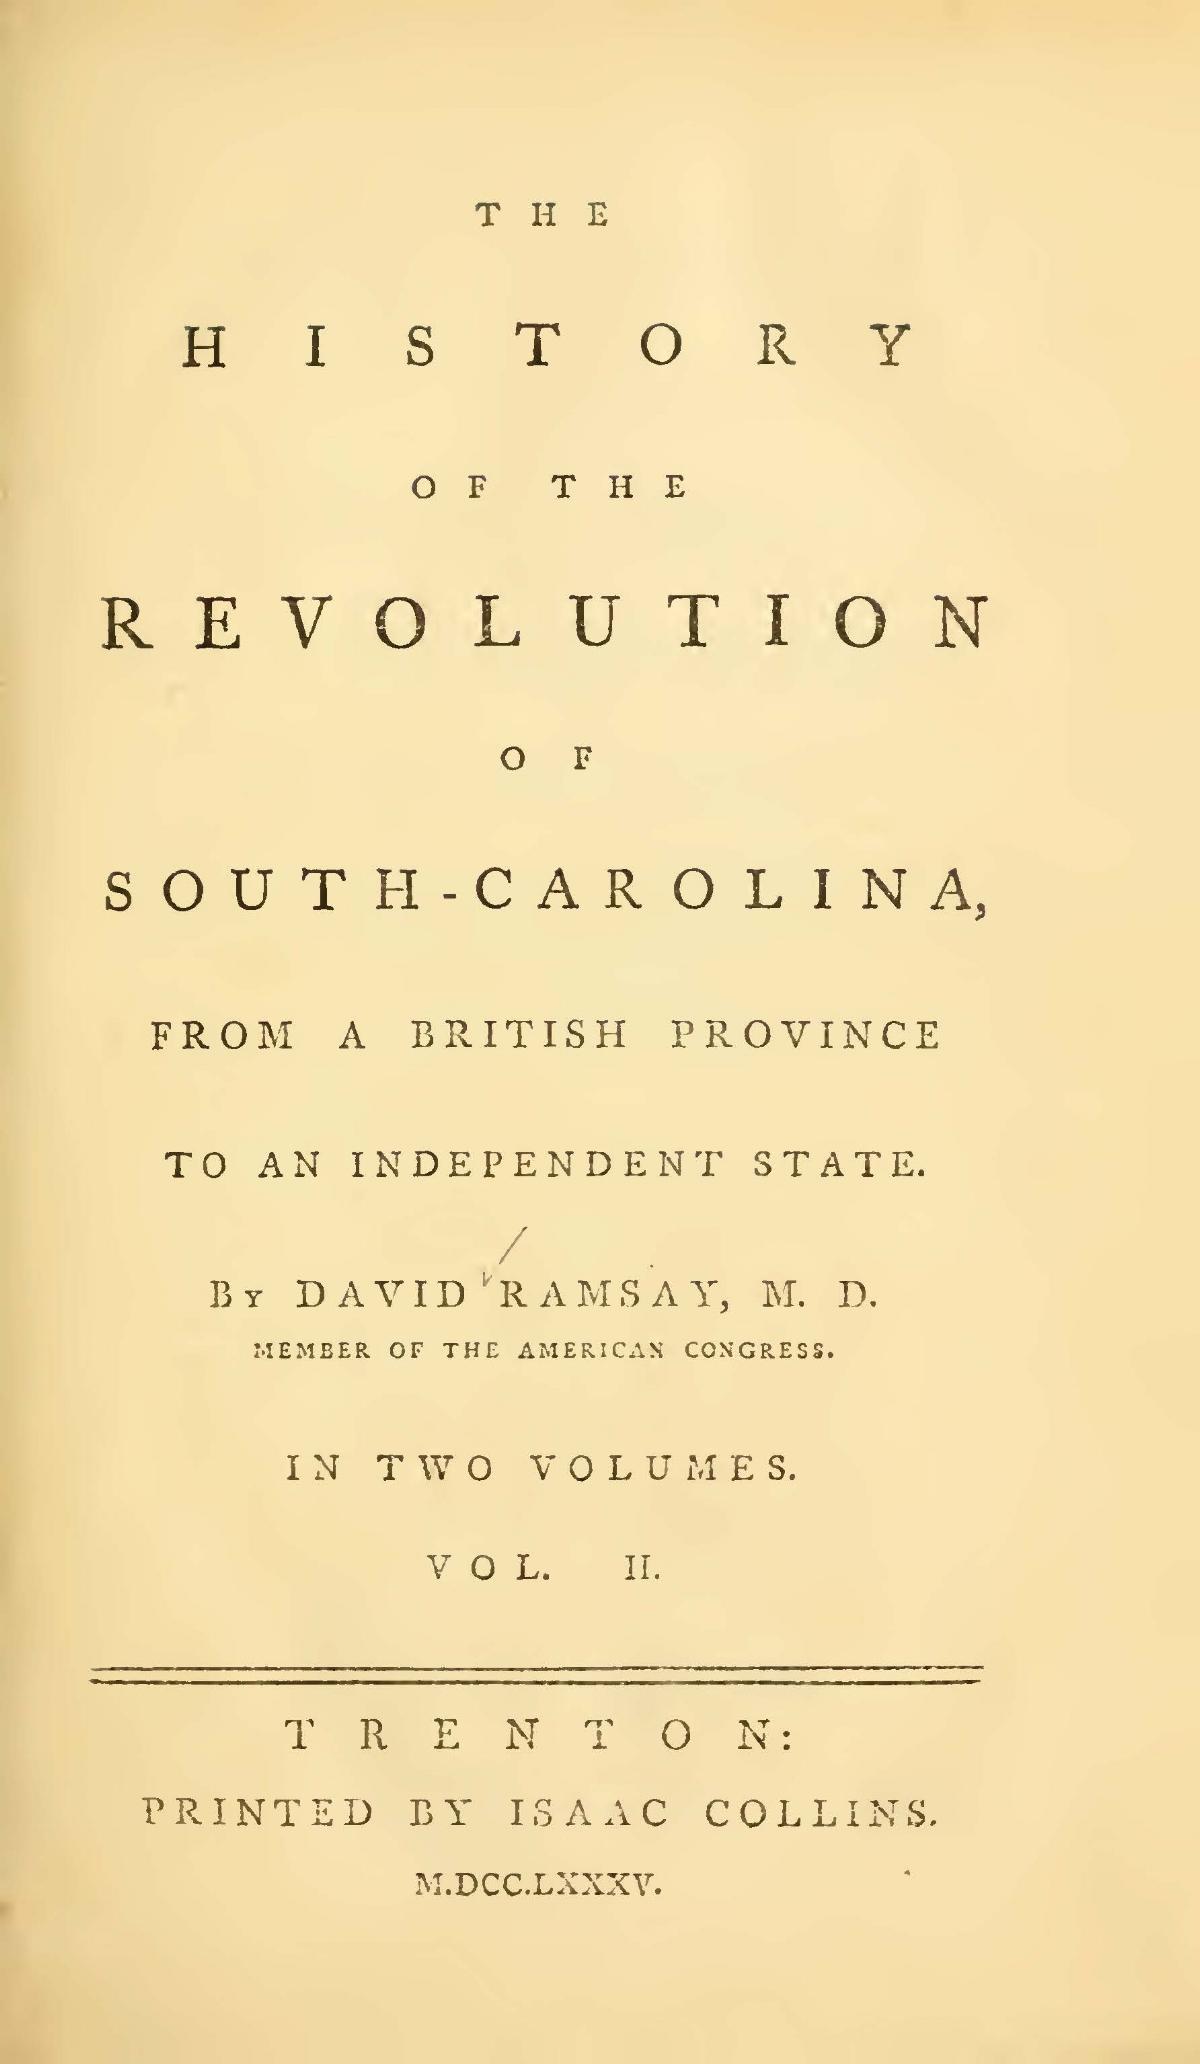 Ramsay, David, The History of the Revolution of South Carolina, Vol. 2 Title Page.jpg